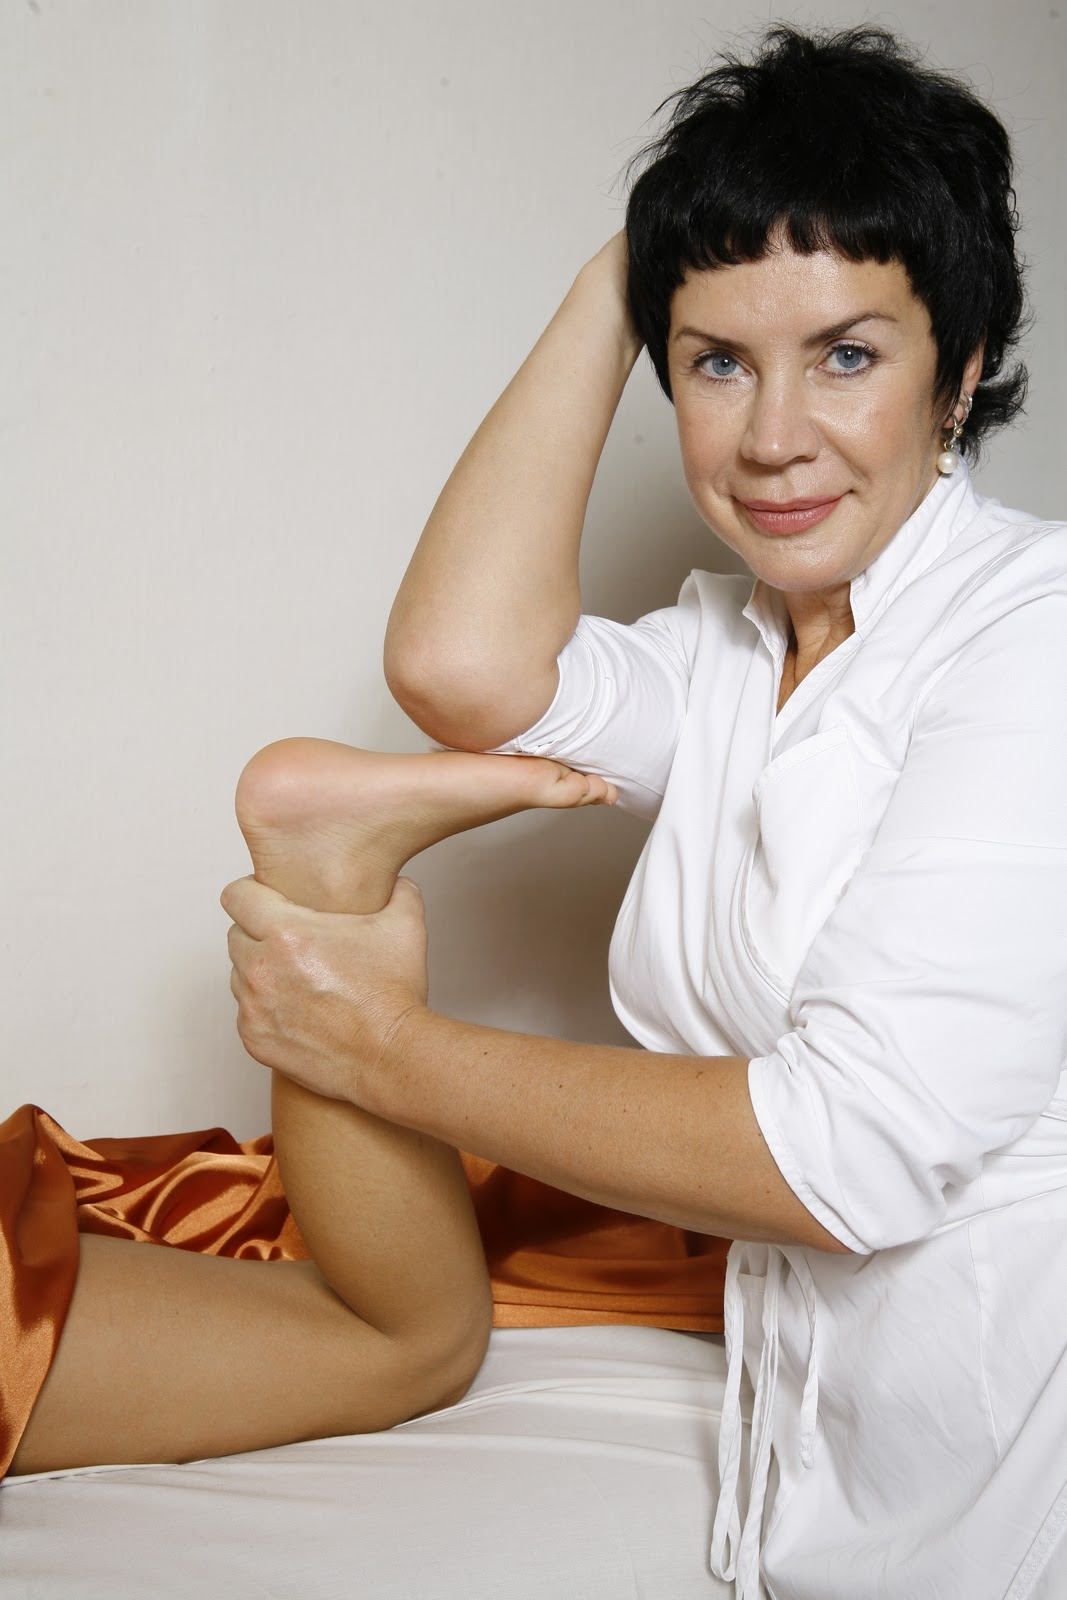 Самомассаж лица Елены Земсковой: техника